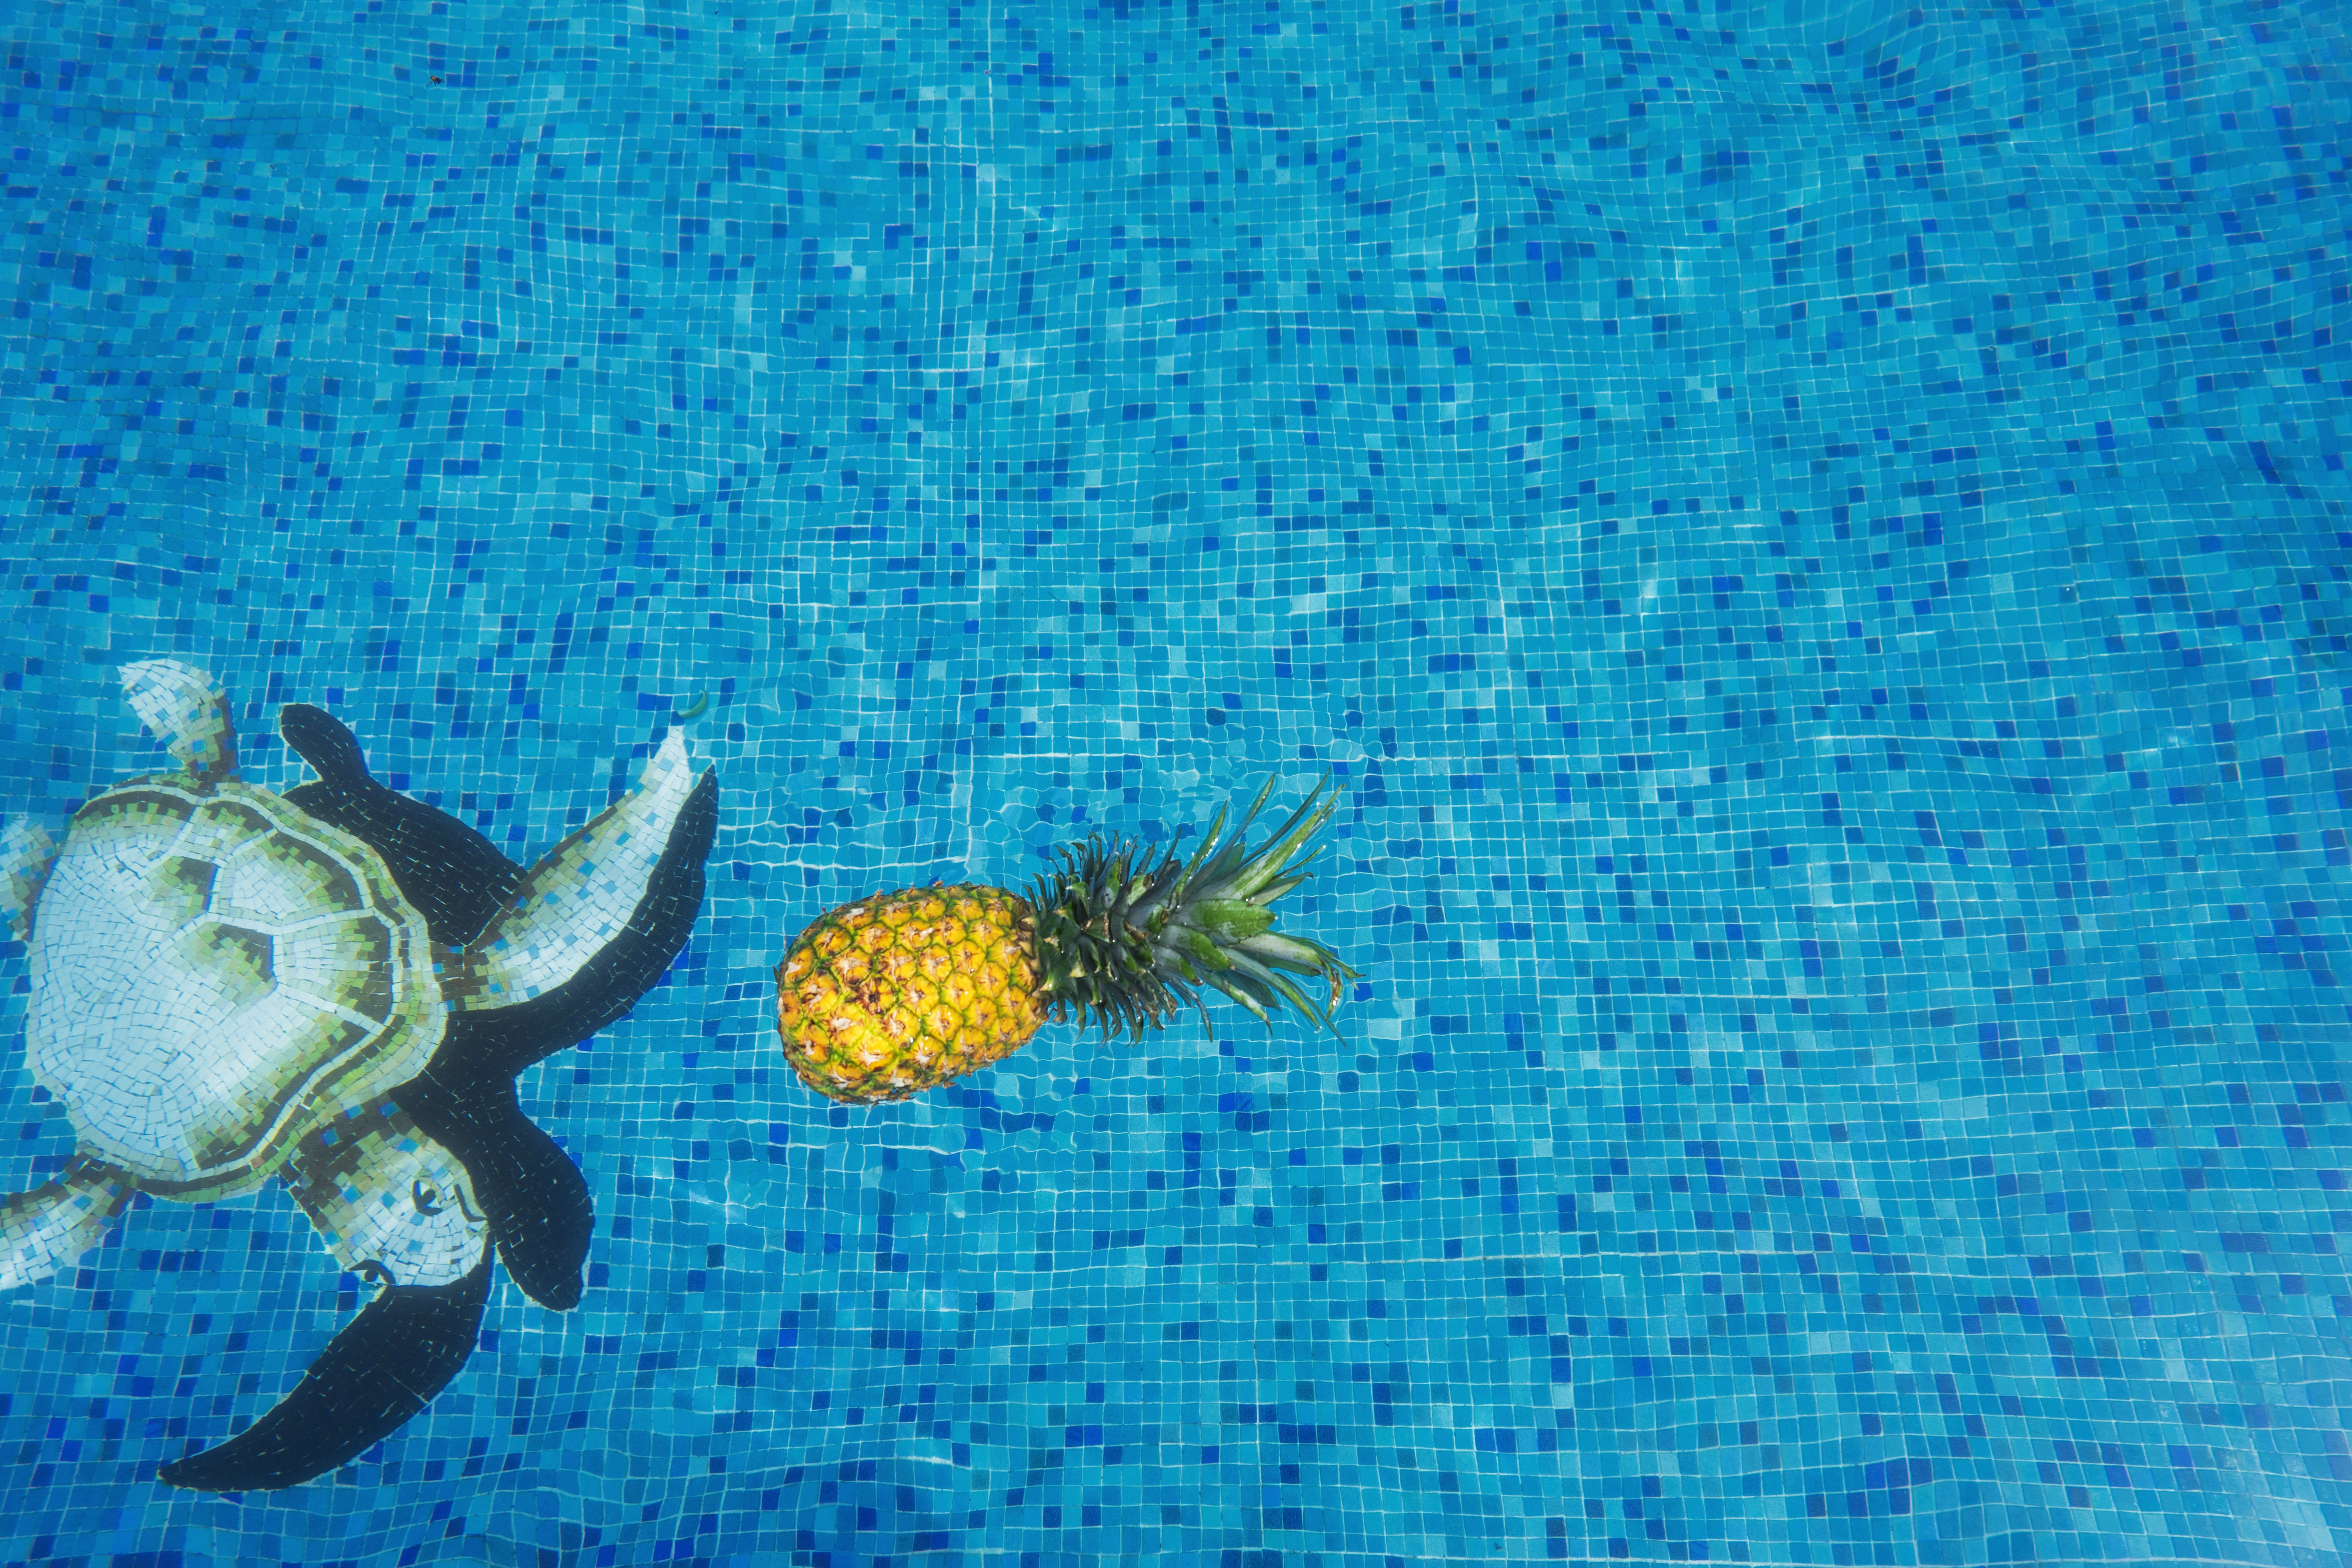 pineapple-supply-co-244472-unsplash.jpg